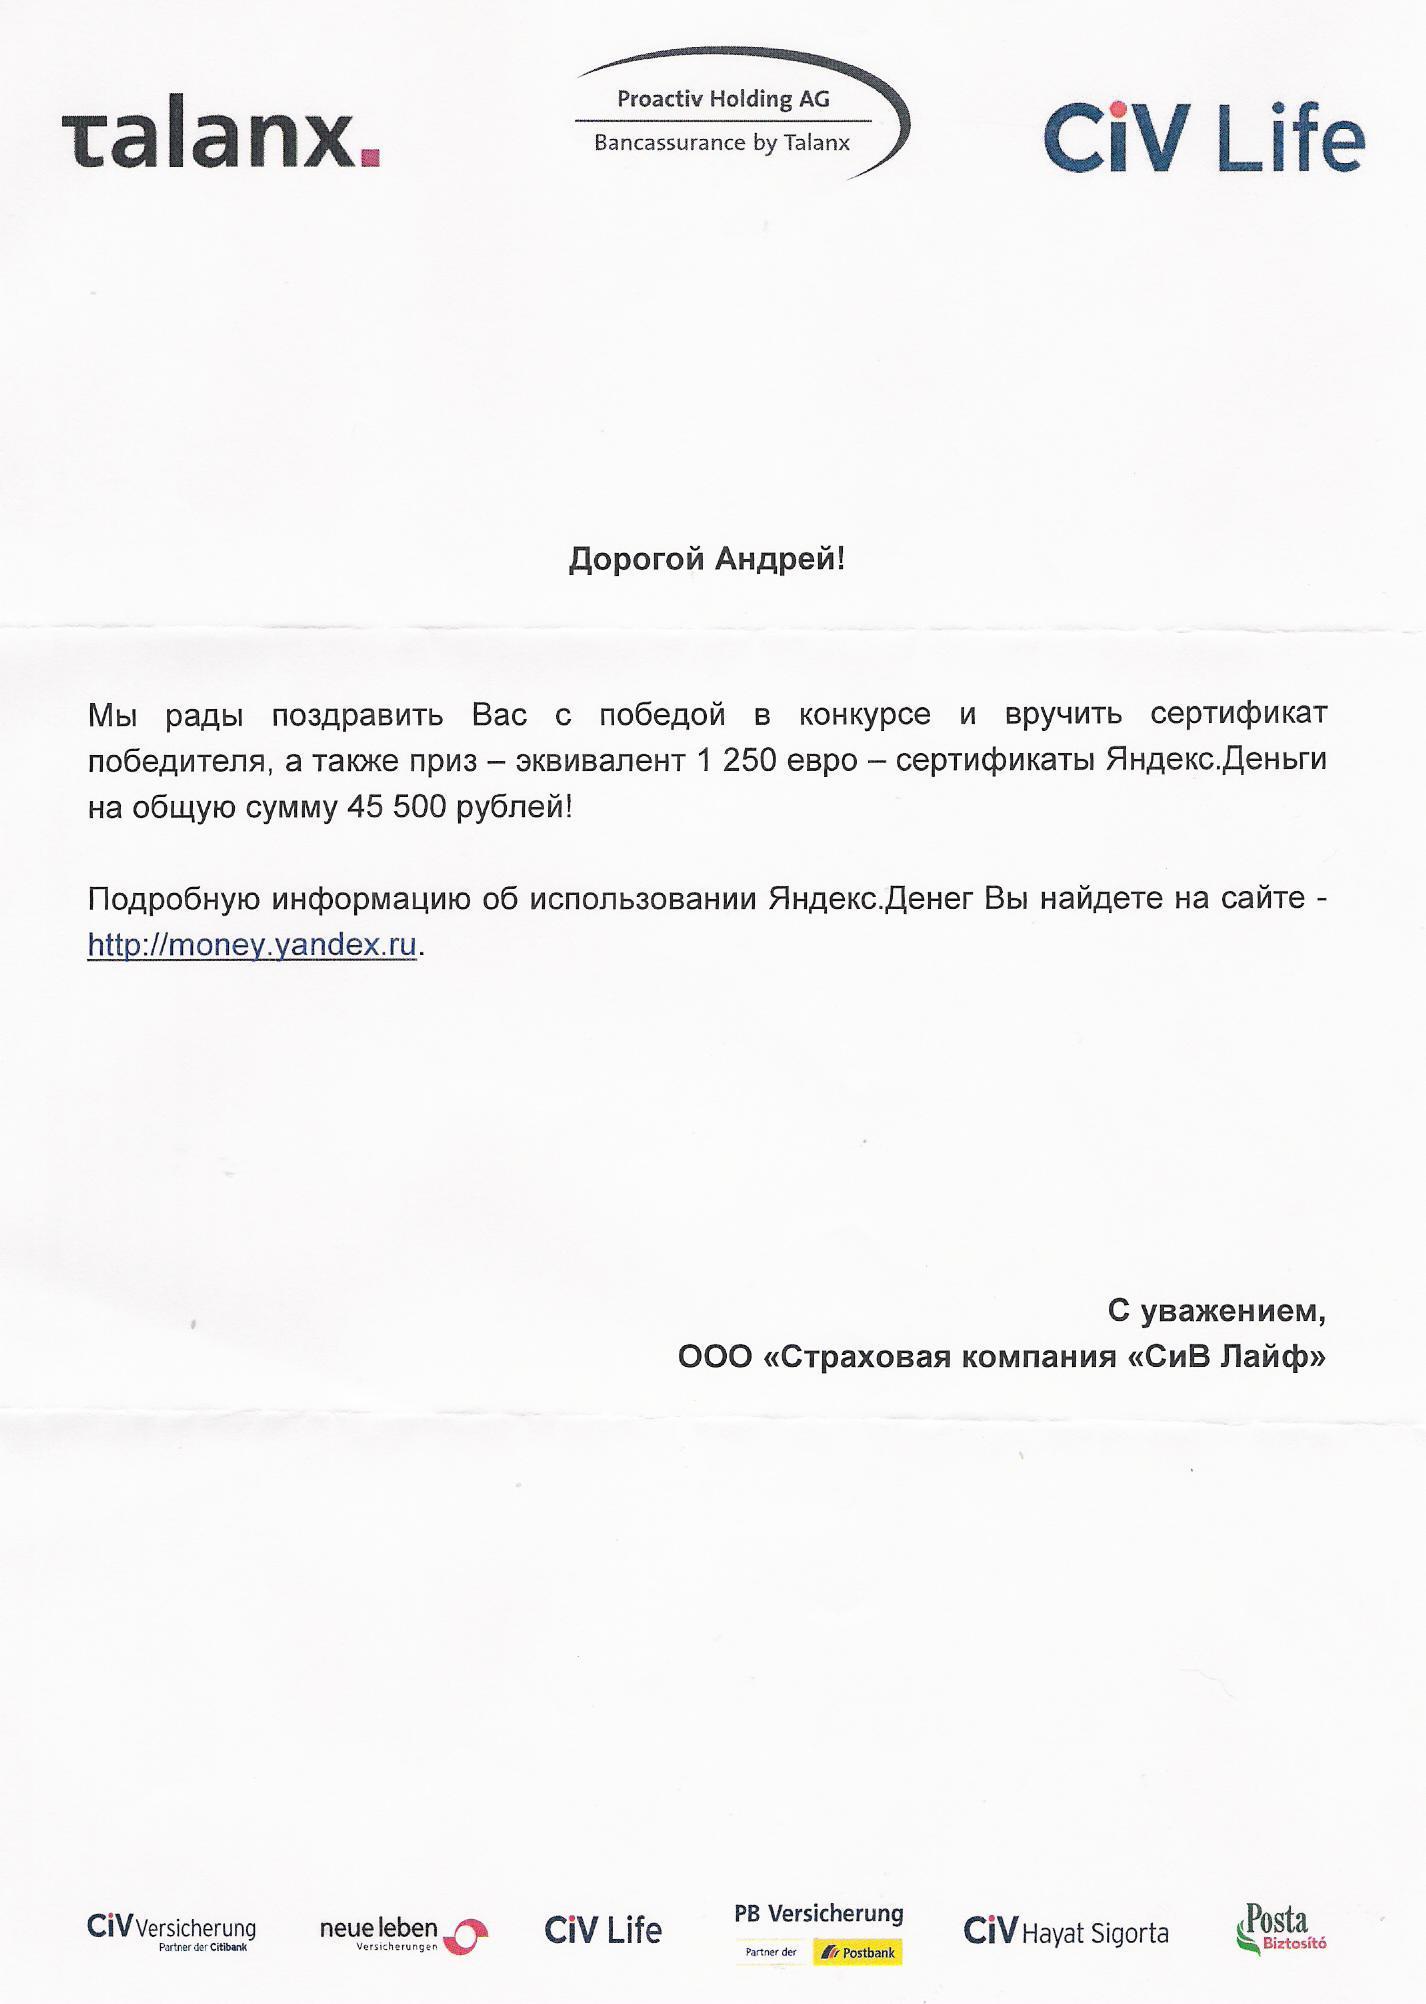 Andrey Zhivotov Civ-Life Citibank Talanx